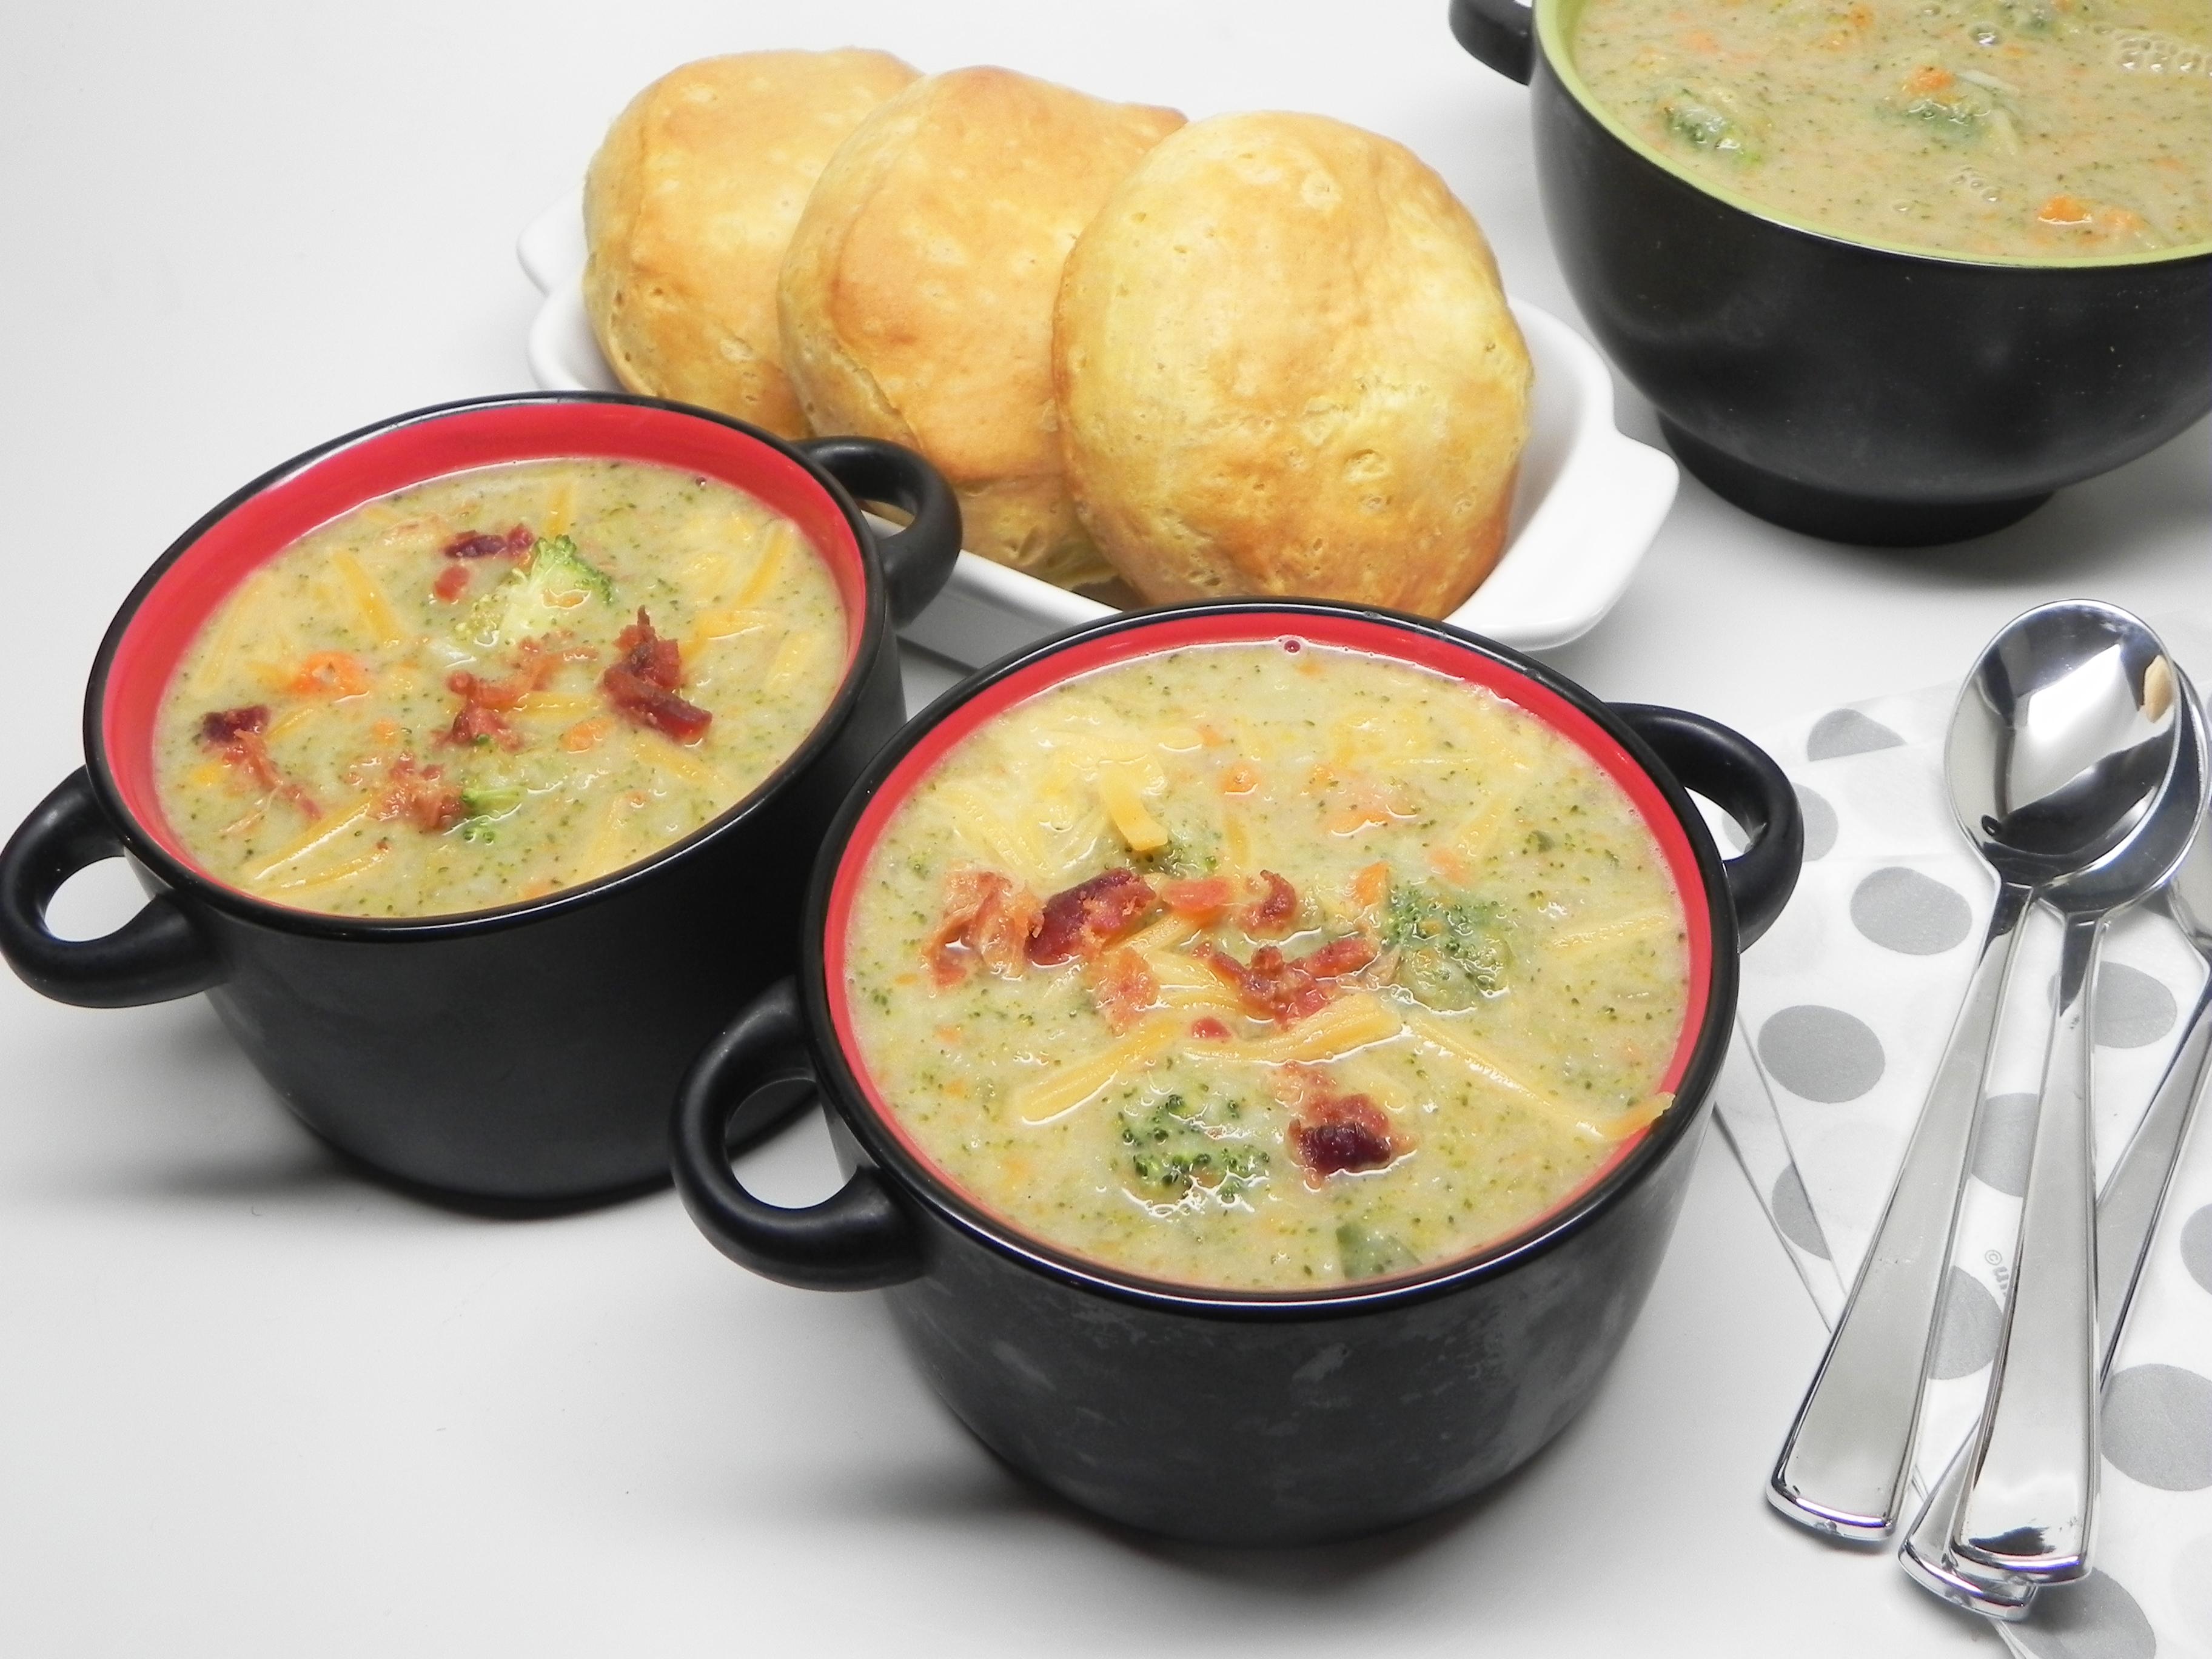 Broccoli No-Cheese Soup Stephen Williams